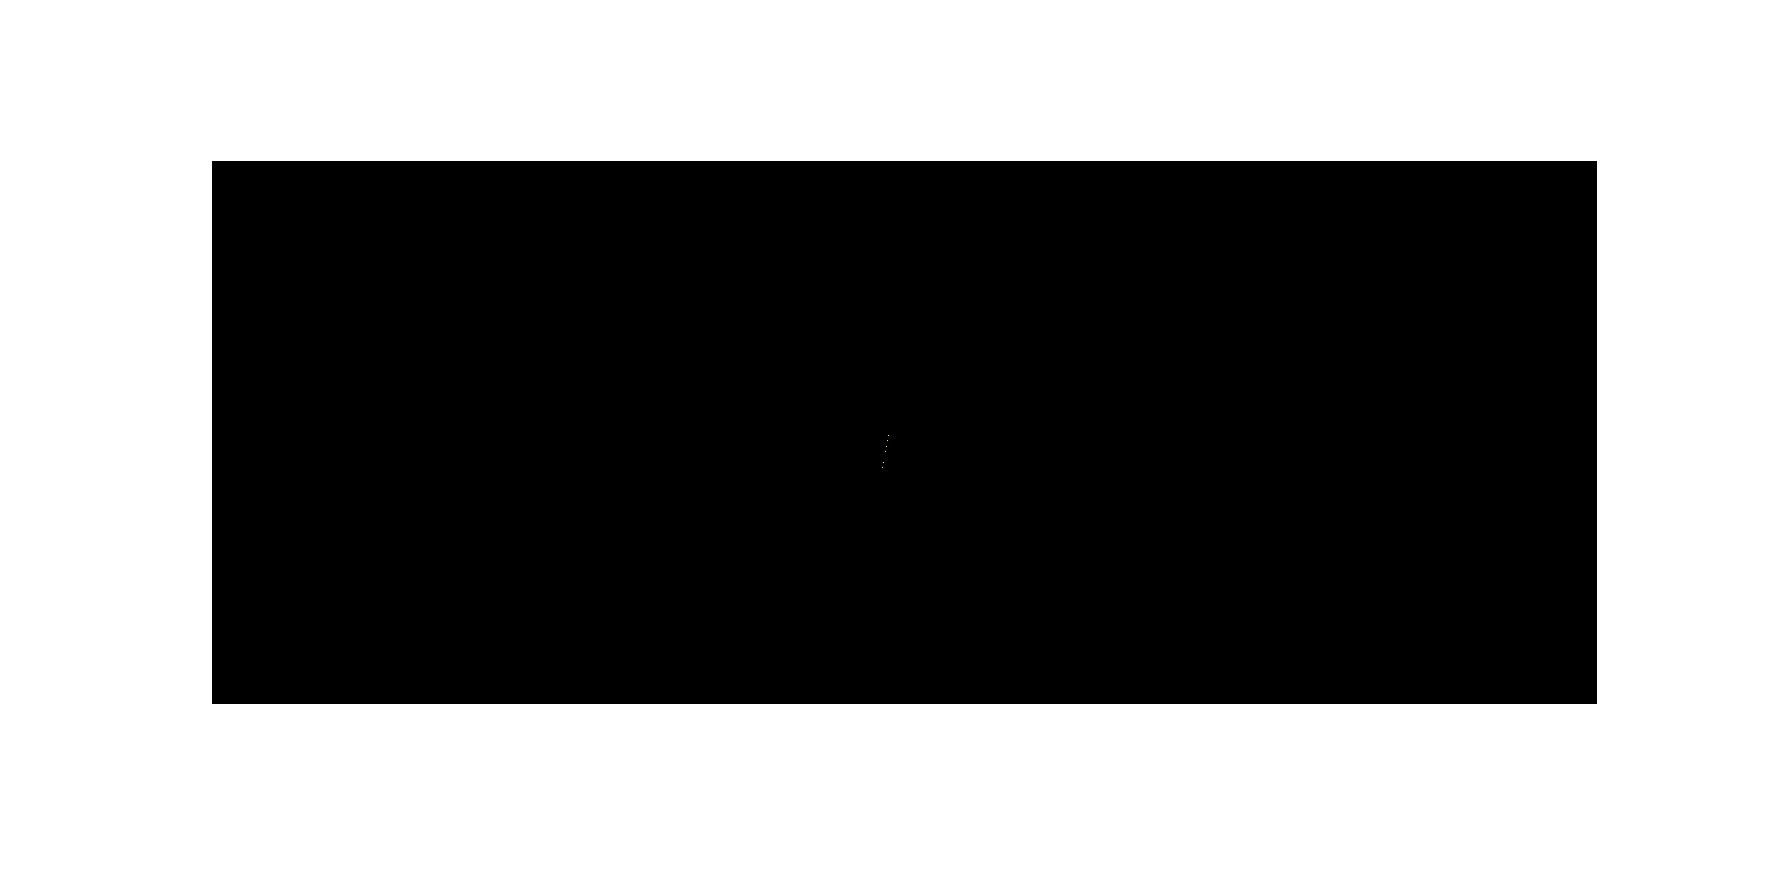 NEW EUROPCAR BB-Transp_Bkgd-RGB black.png